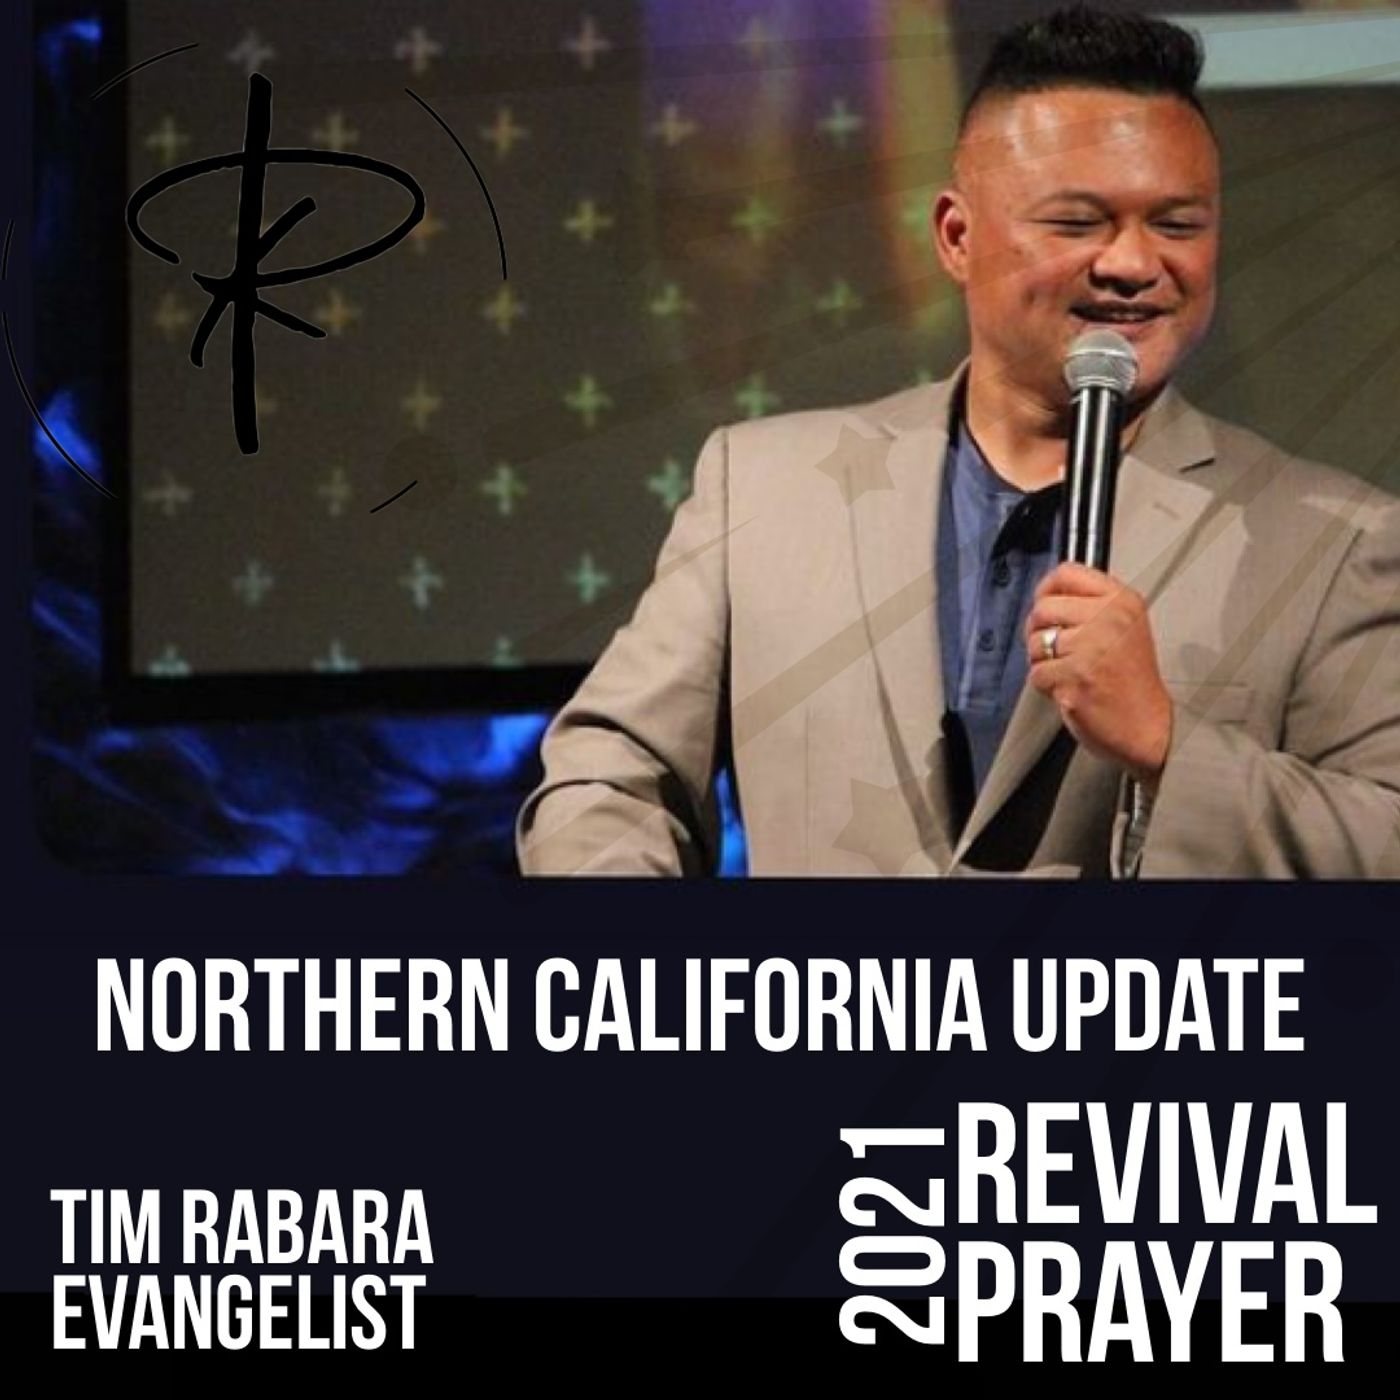 Northern California Update 10 Day Revival | Evangelist Tim Rabara